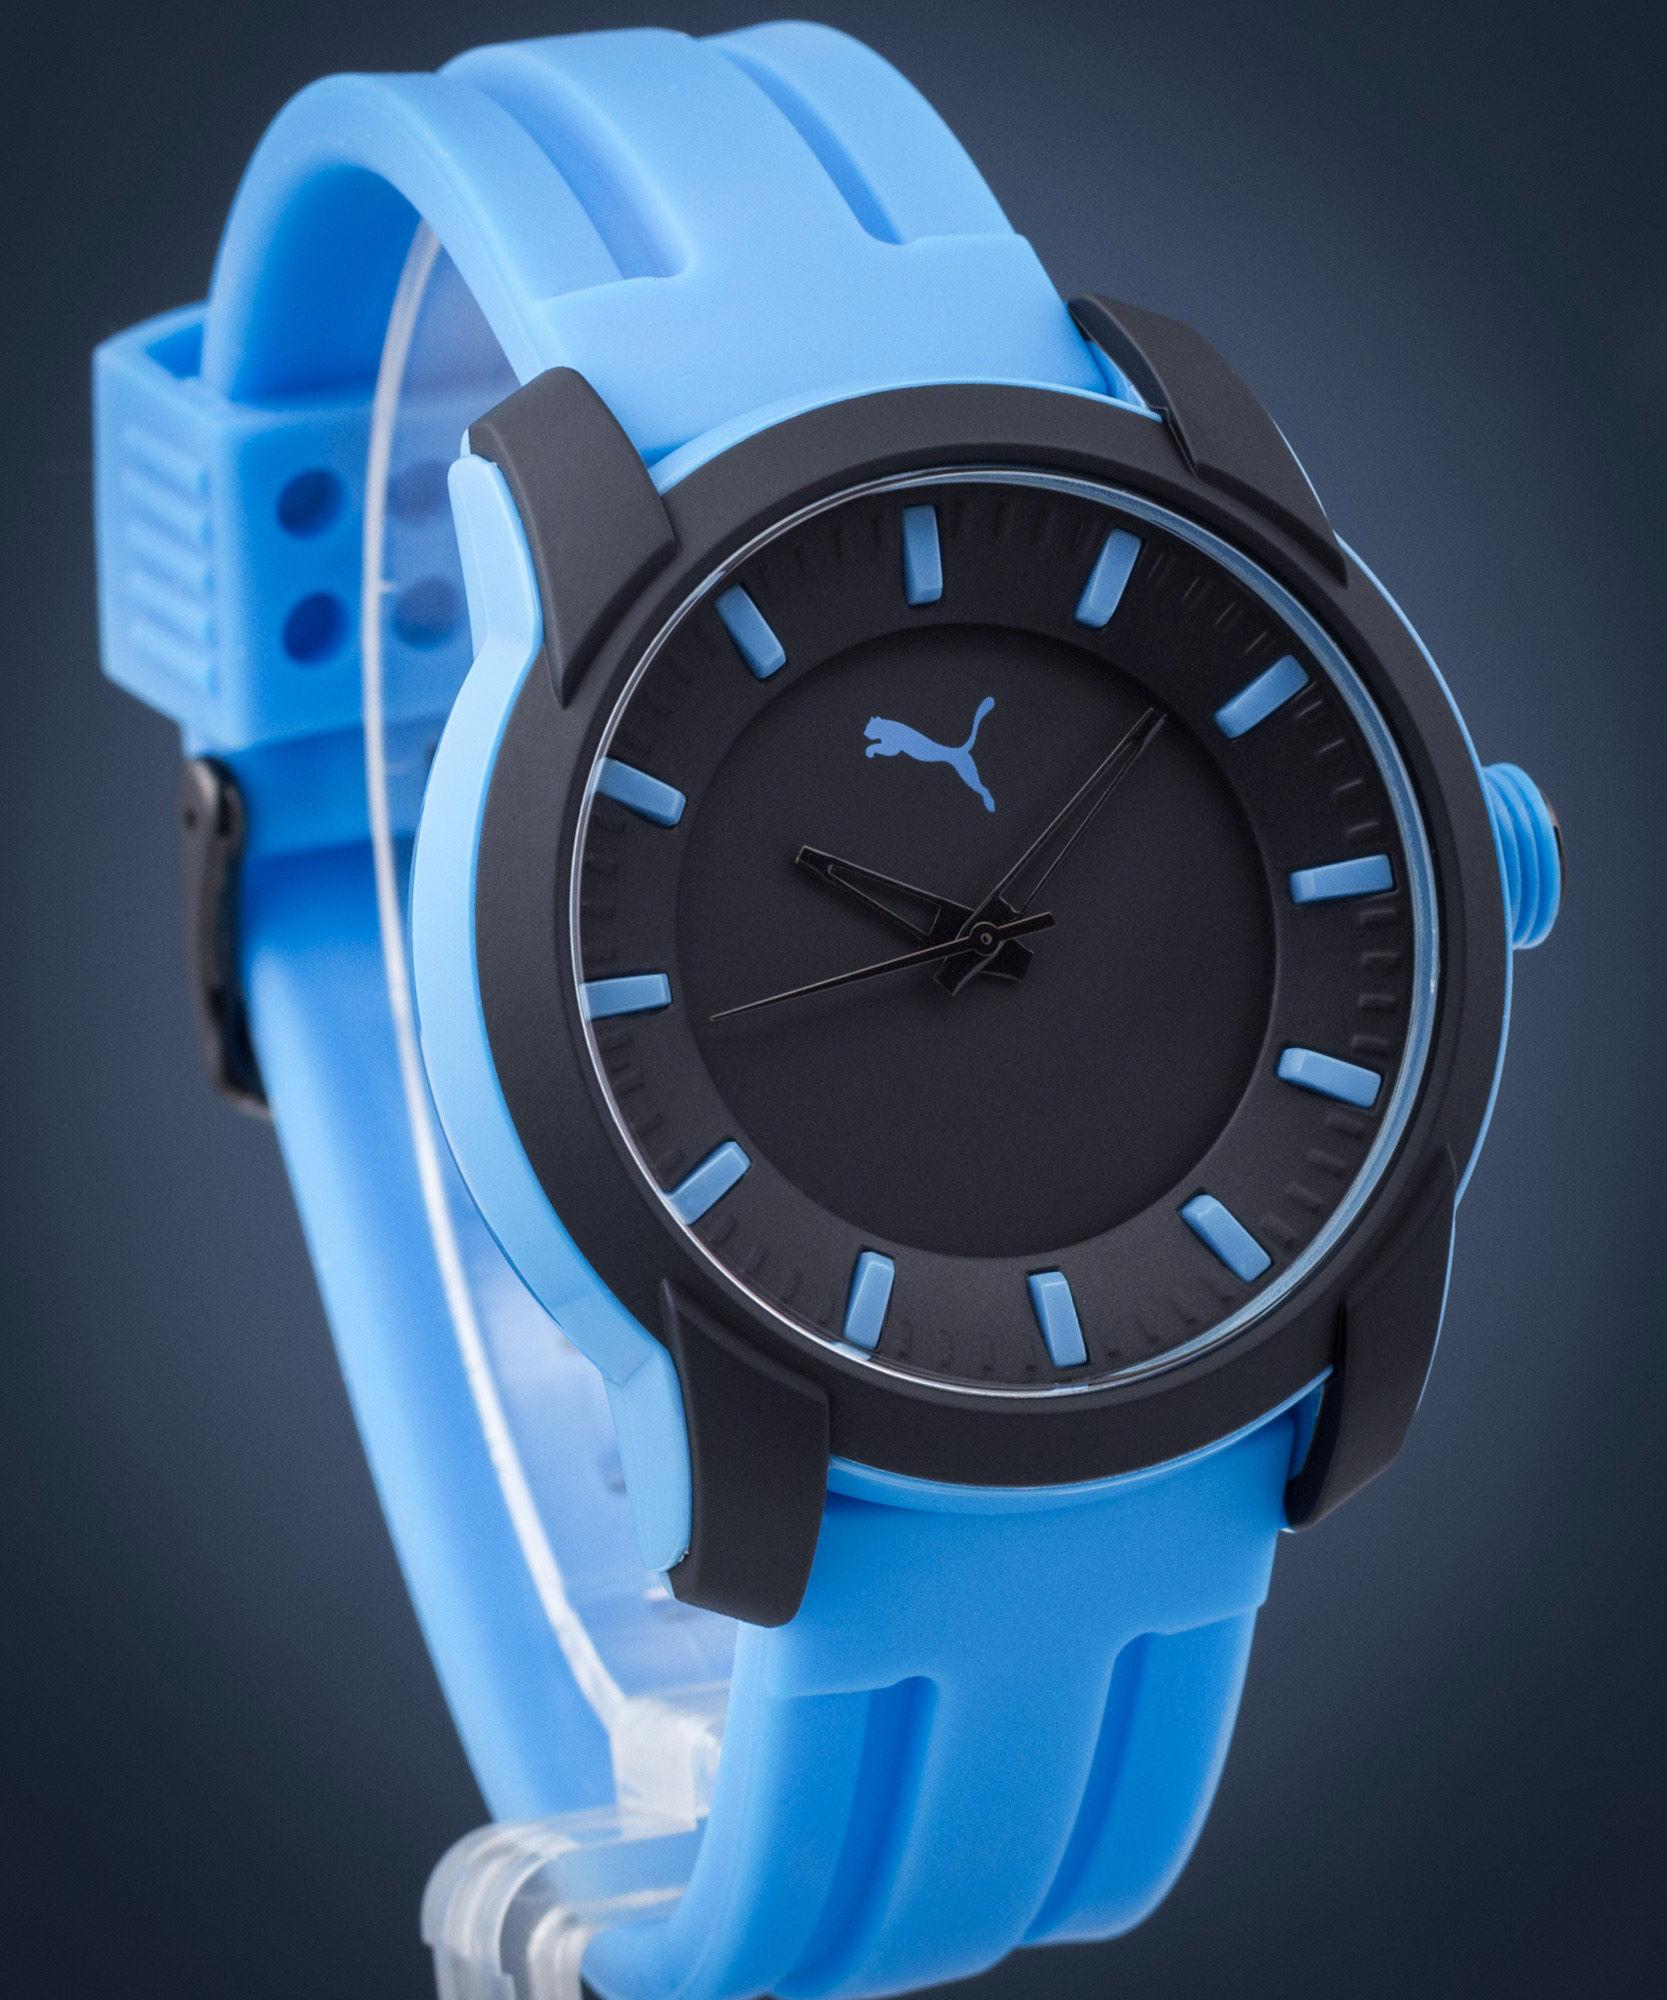 Zegarek męski Puma Blue Silicone